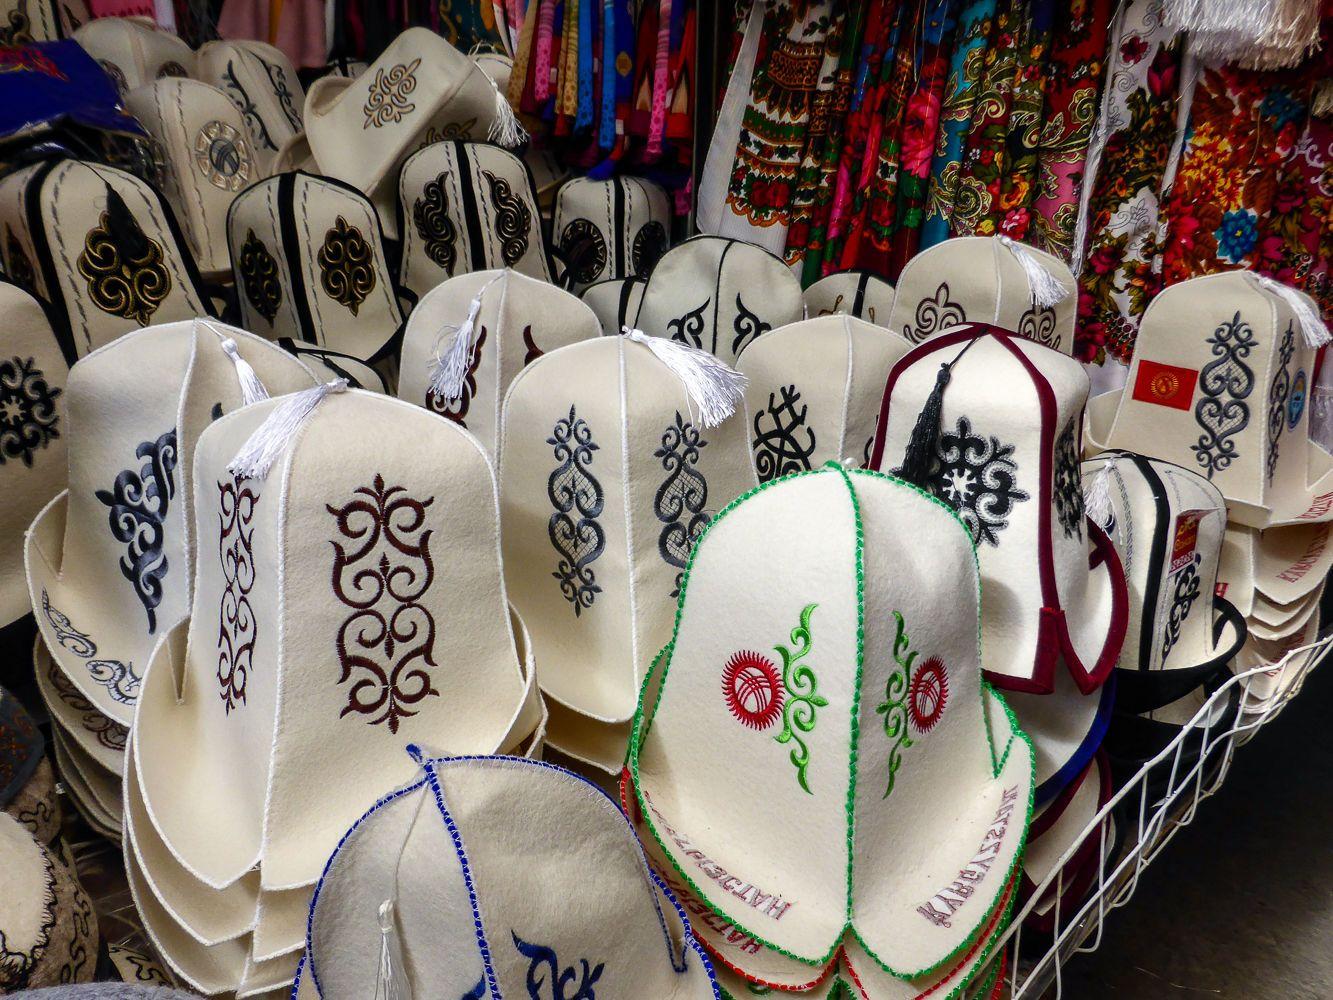 Osh Bazaar- Bishkek city tour shopping